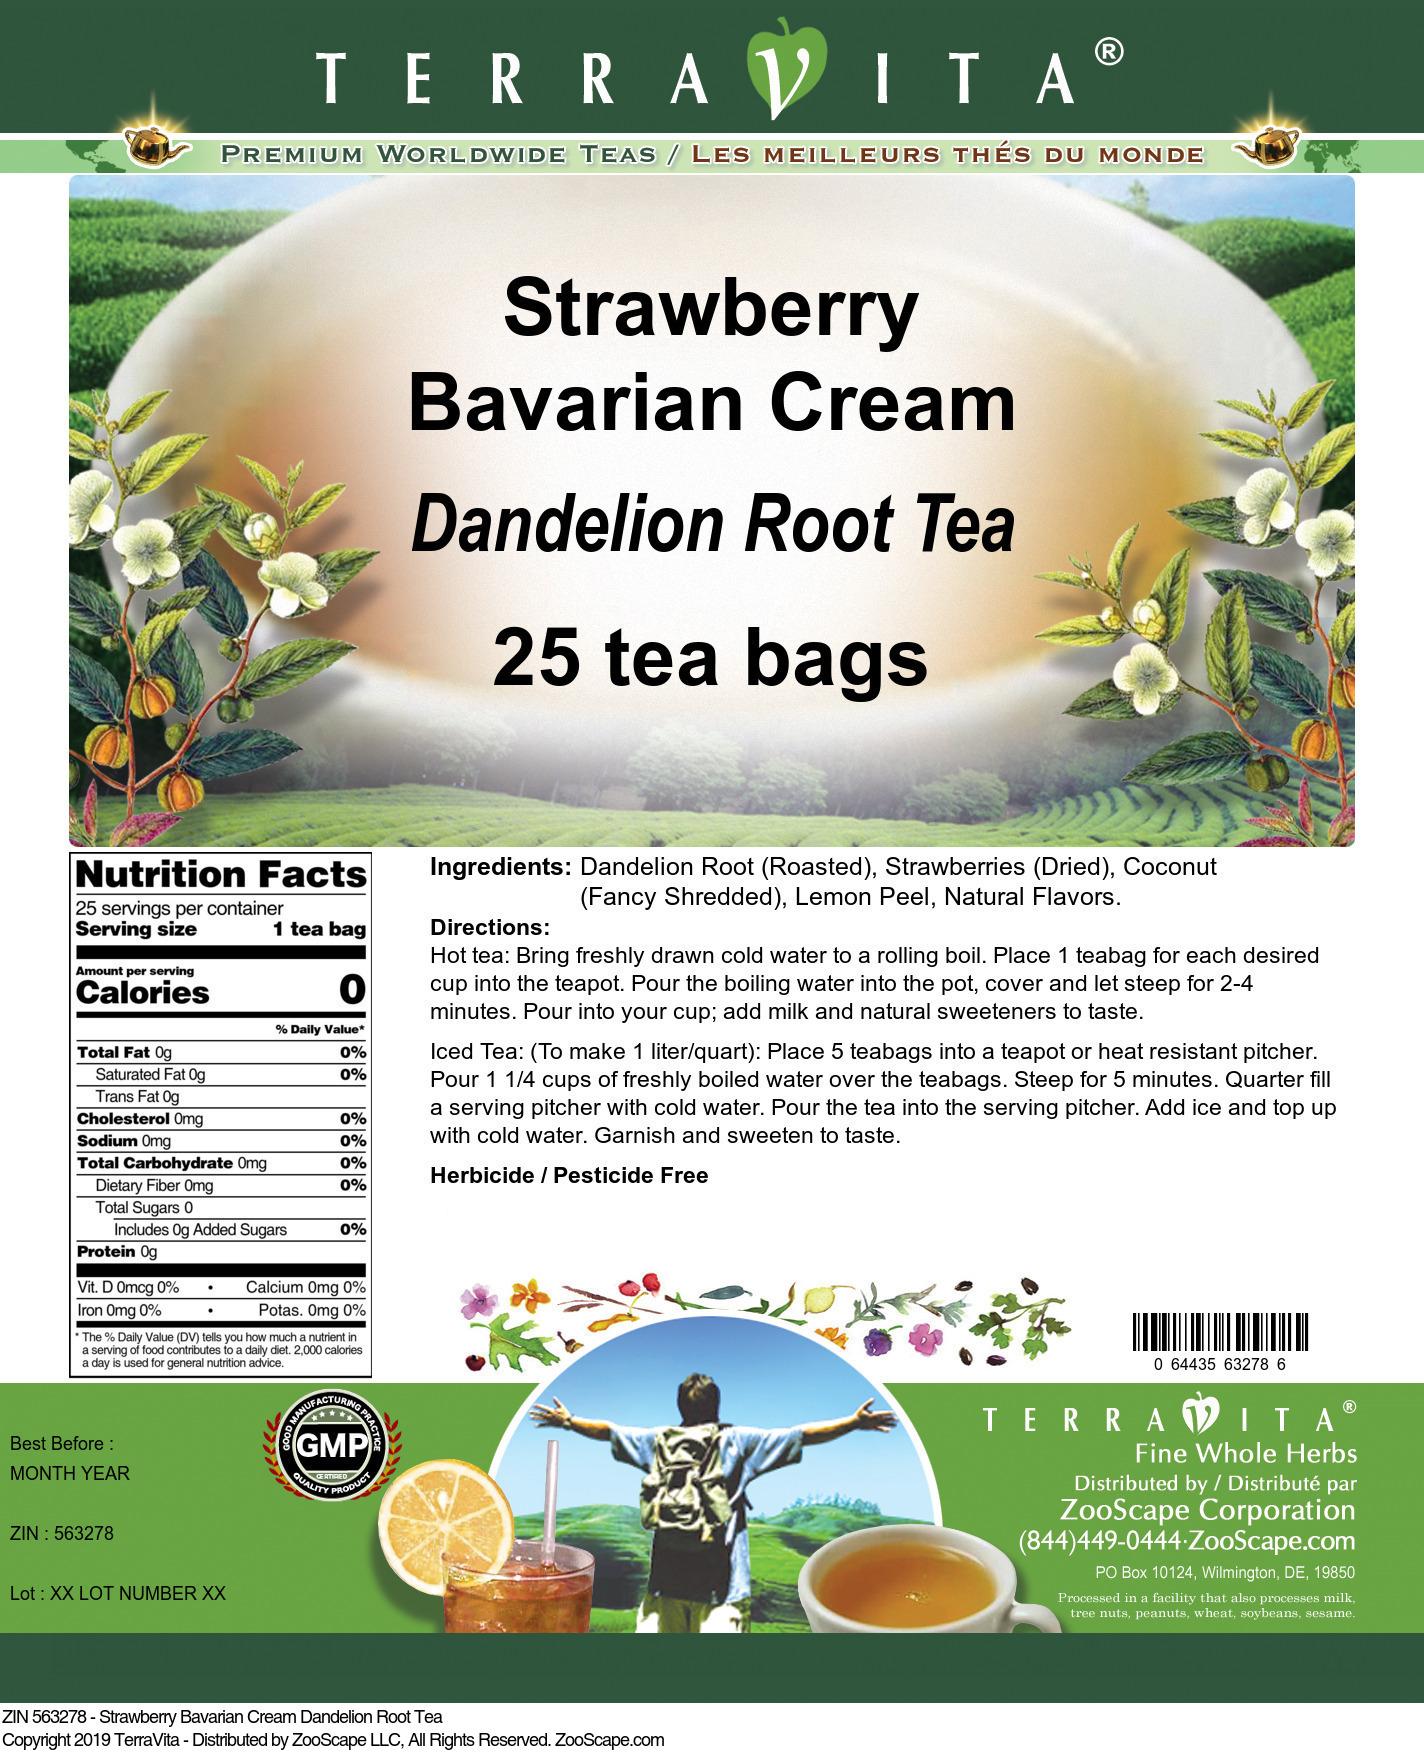 Strawberry Bavarian Cream Dandelion Root Tea